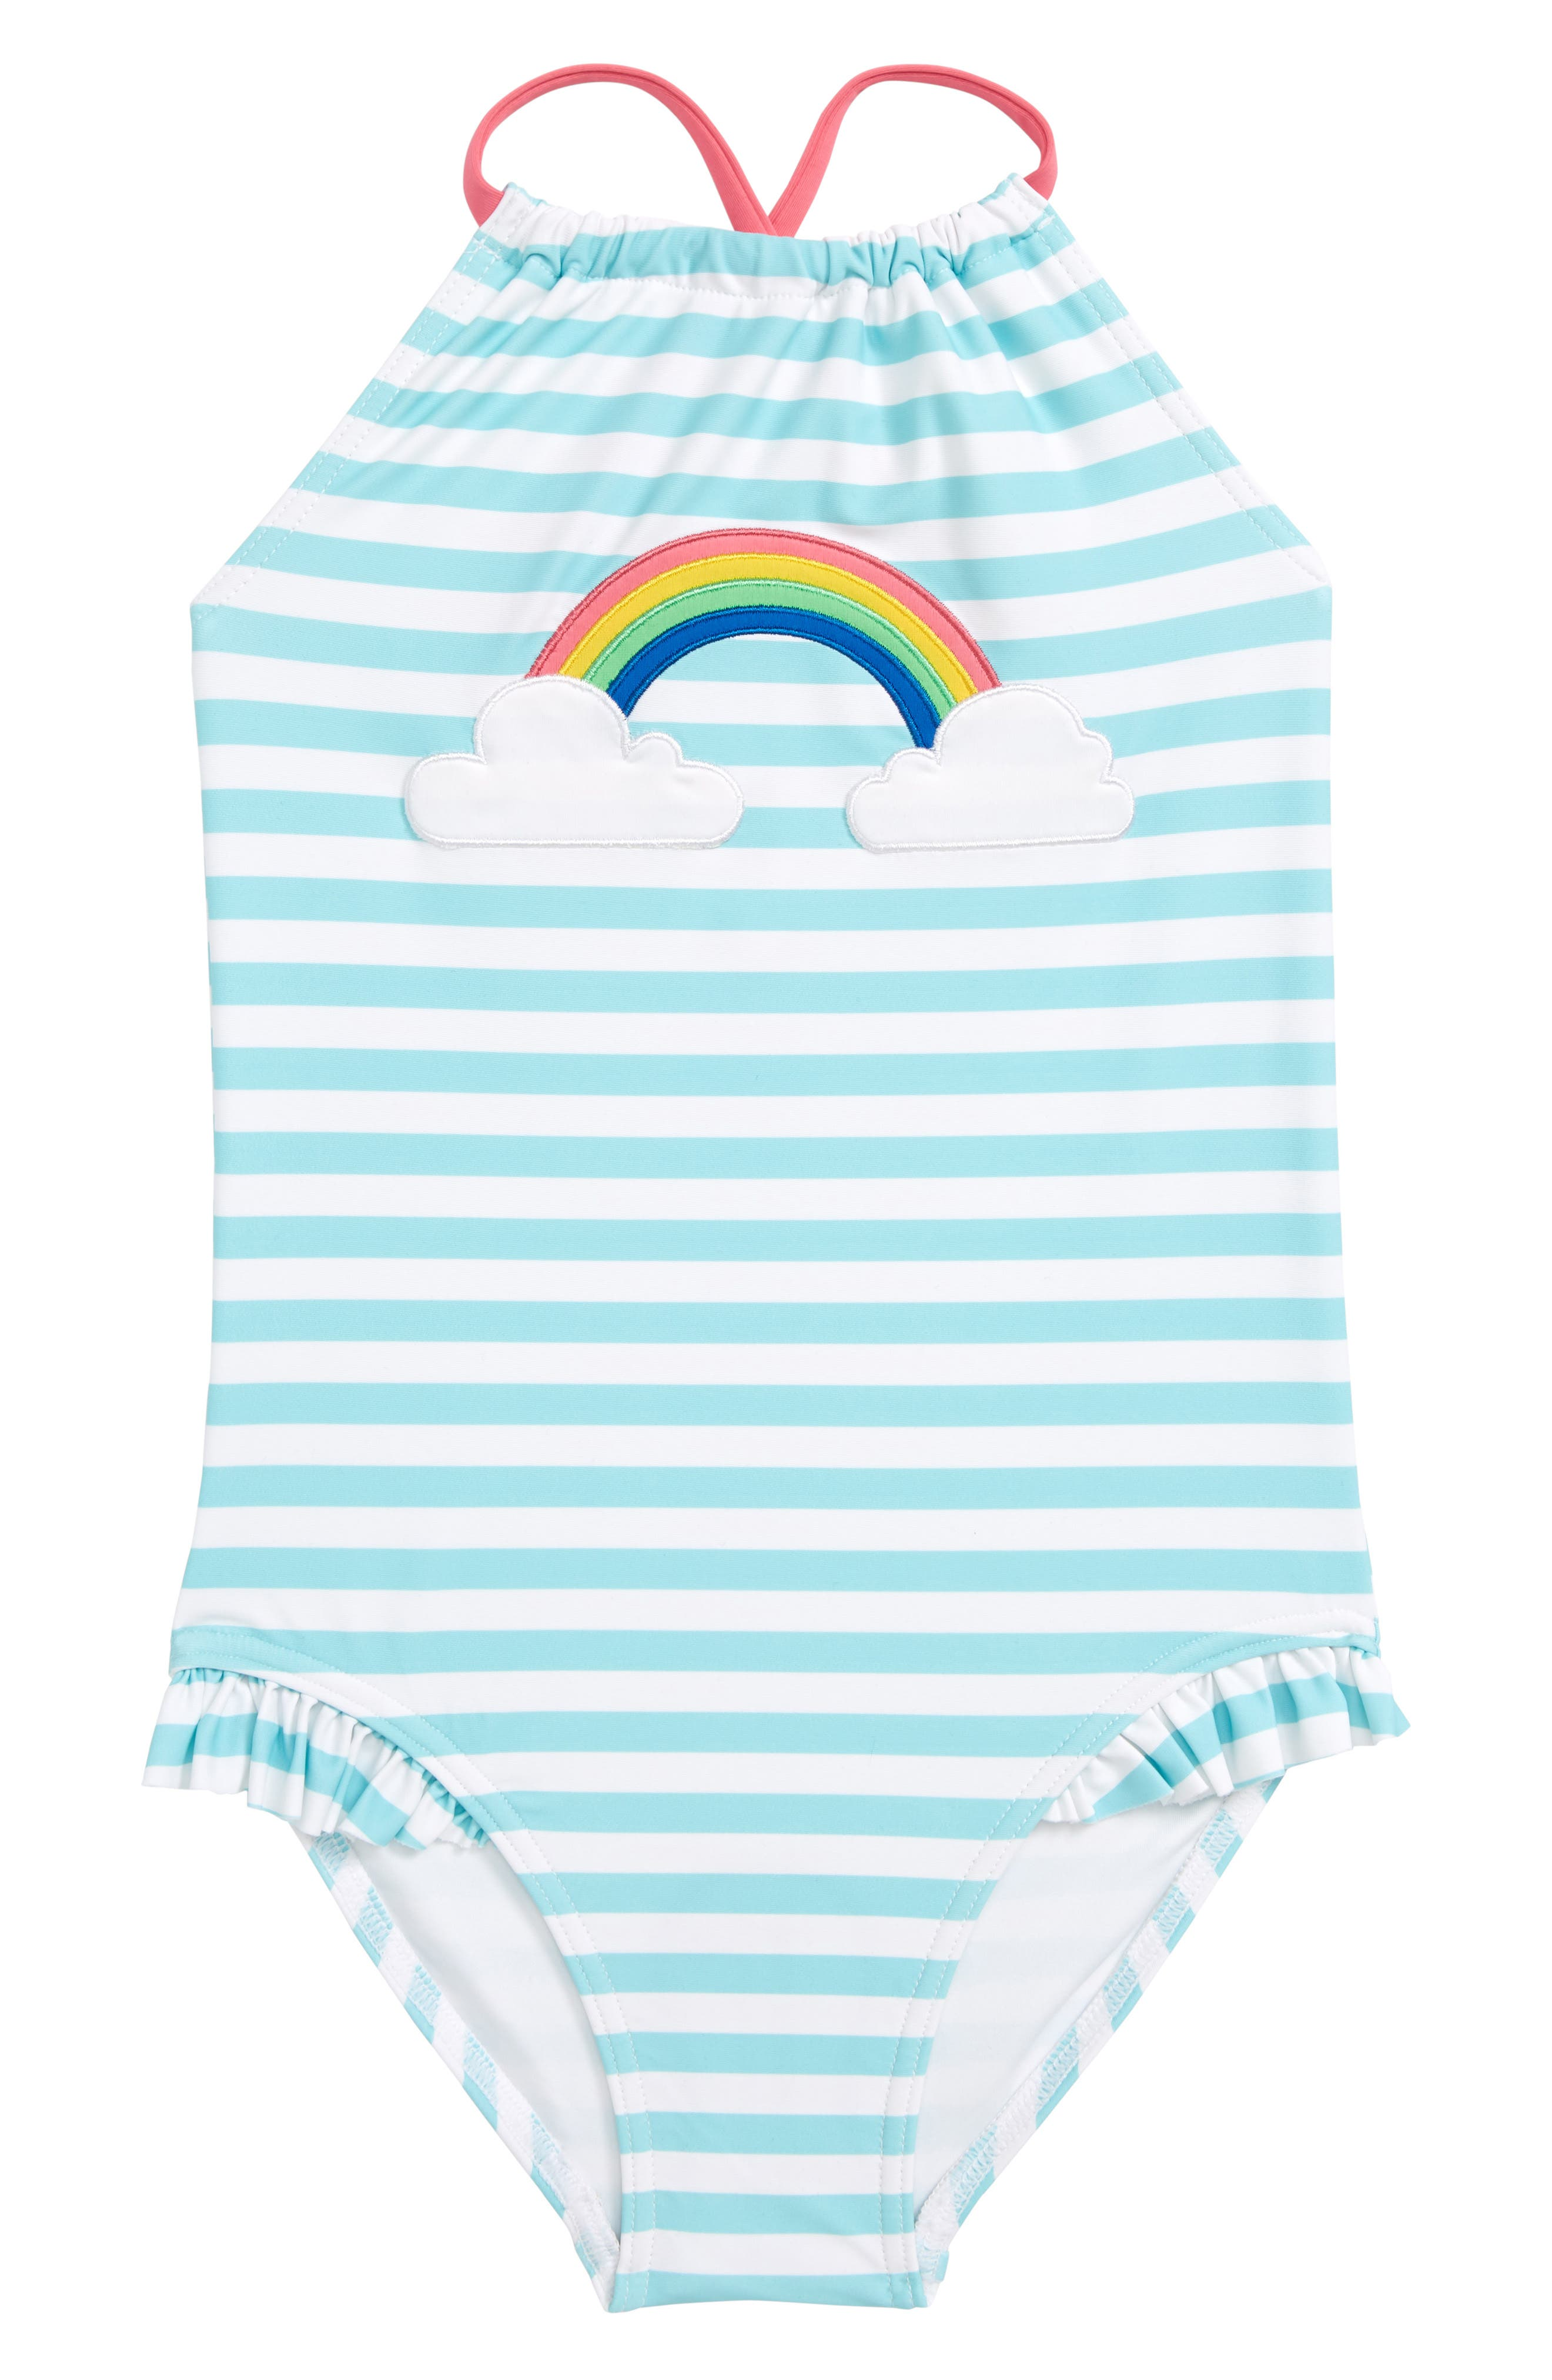 Toddler Girls Tucker  Tate Applique OnePiece Swimsuit Size 3T  Bluegreen